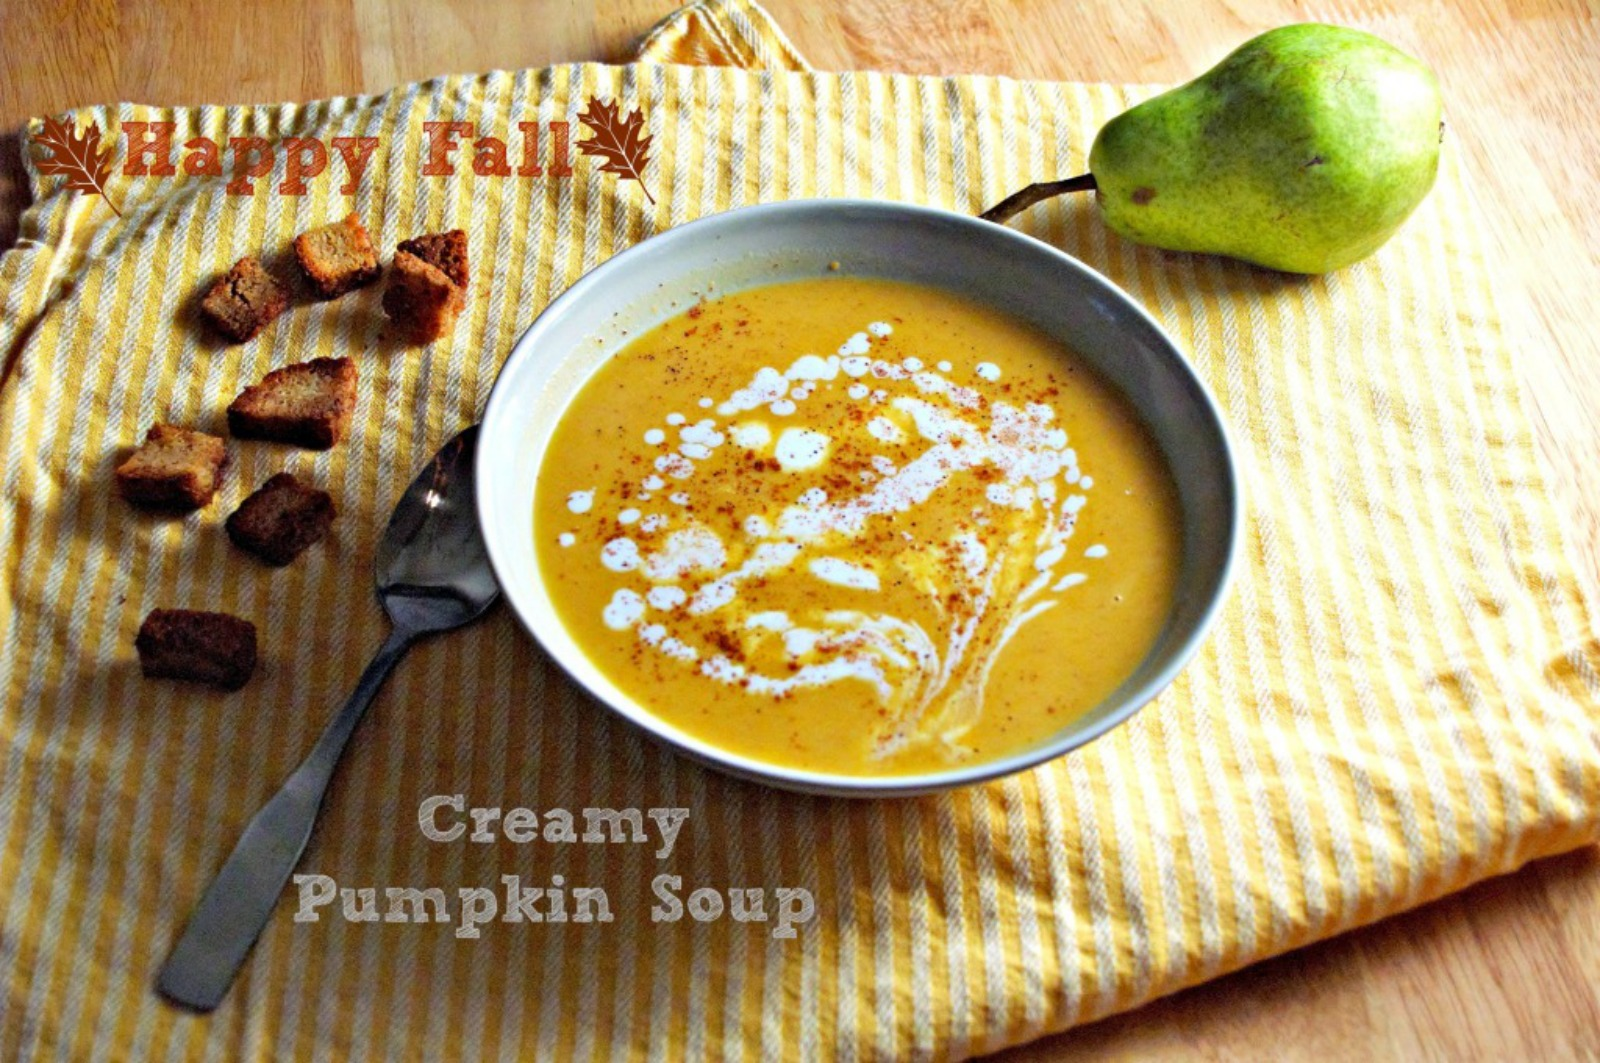 Creamy Pumpkin Soup [Vegan]